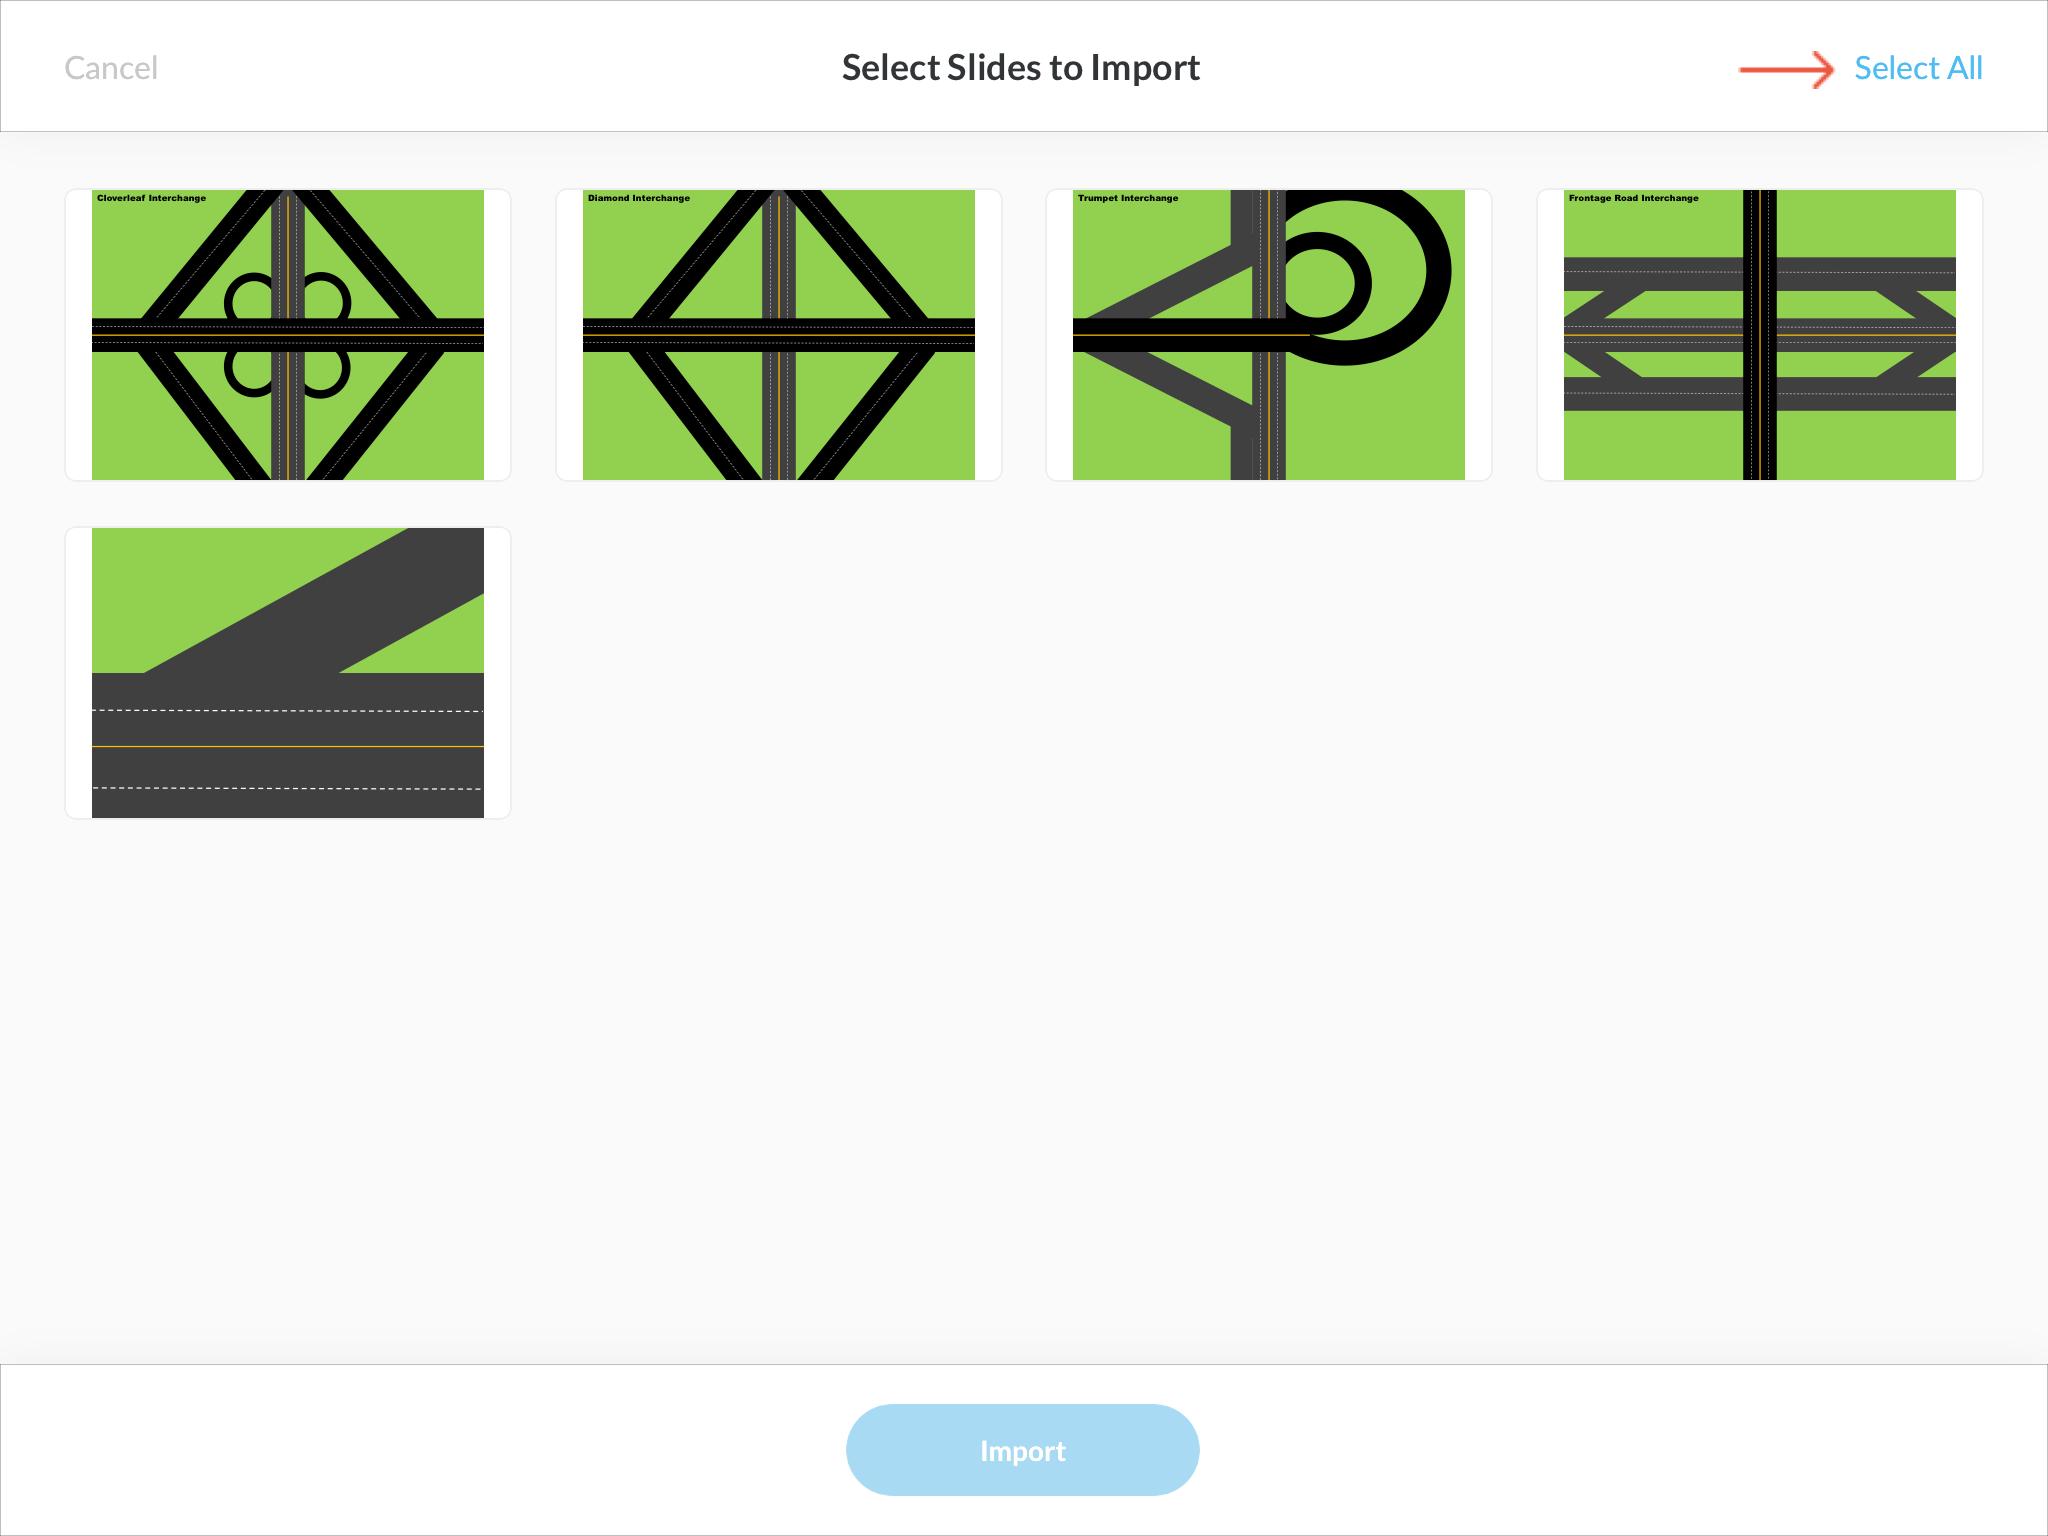 Step 2: Select Slides